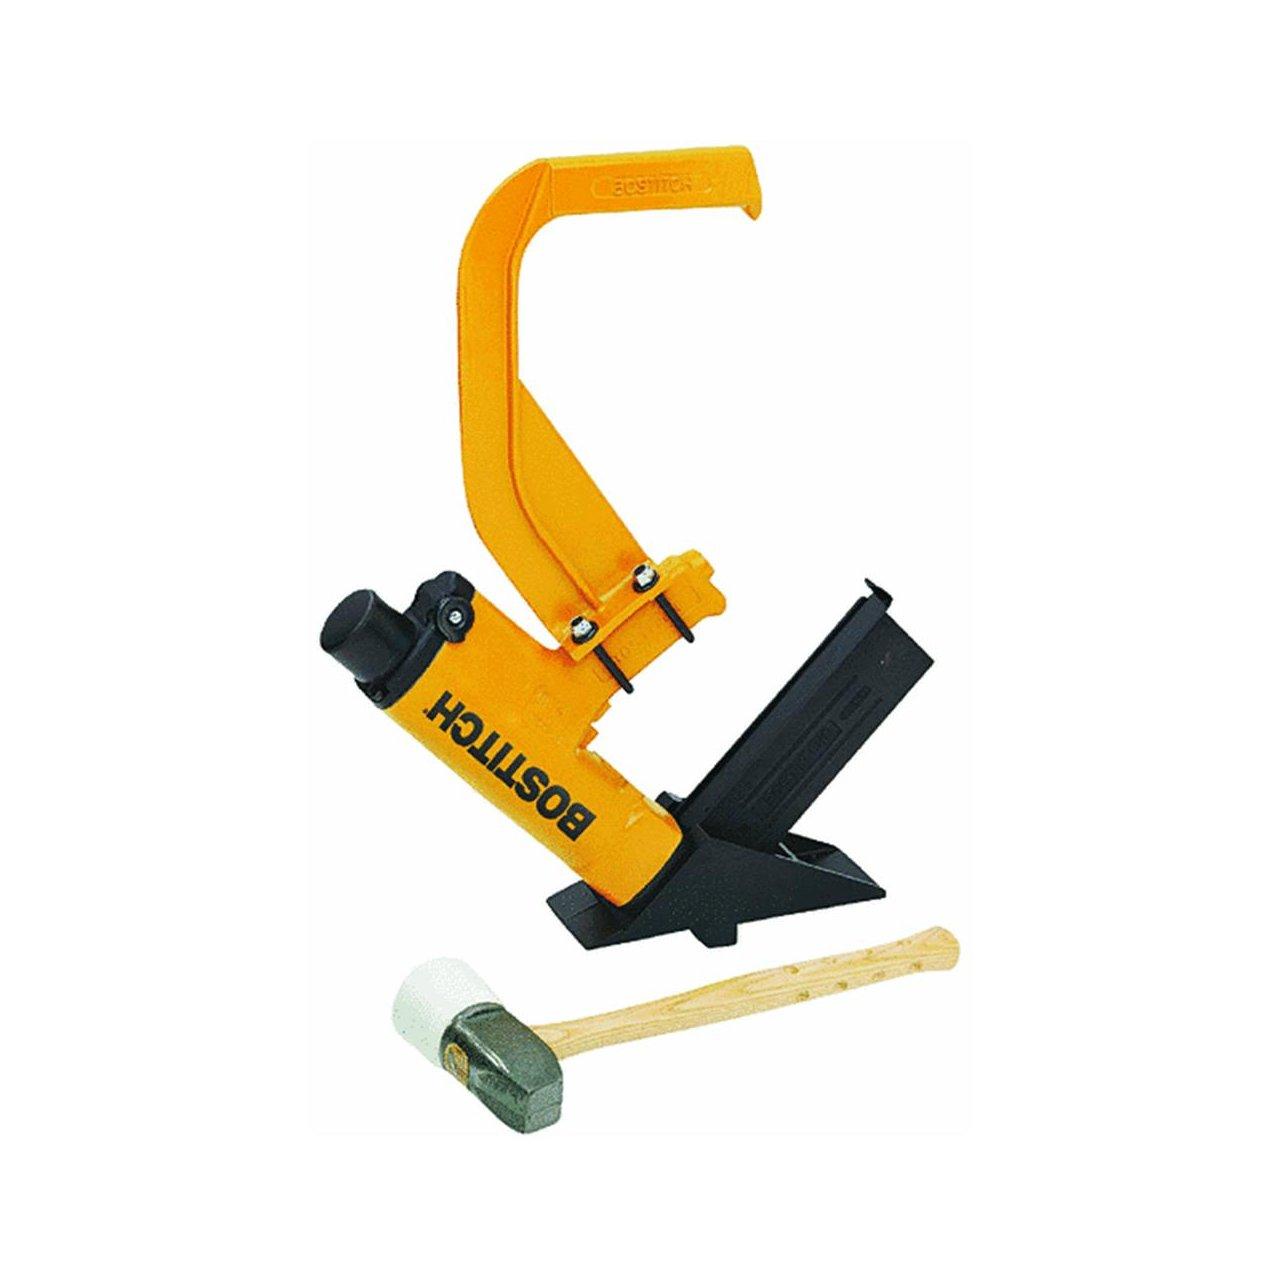 Stanley Bostitch MIIIFS Pneumatic Hardwood Floor Stapler - Quantity 1